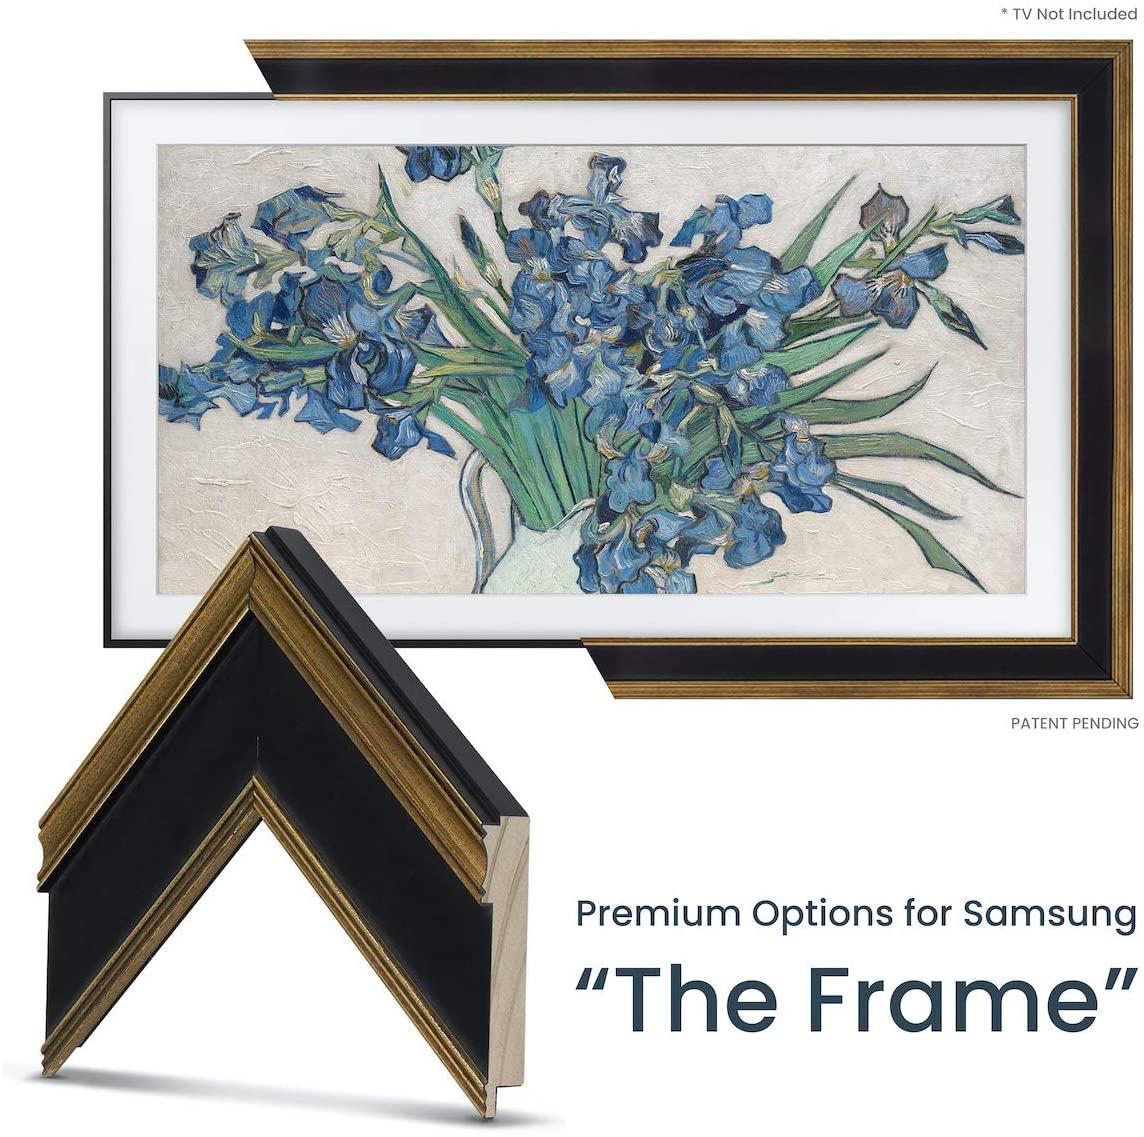 Deco TV Frames - Antique Gold & Black Frame Custom for Samsung The Frame TV (55